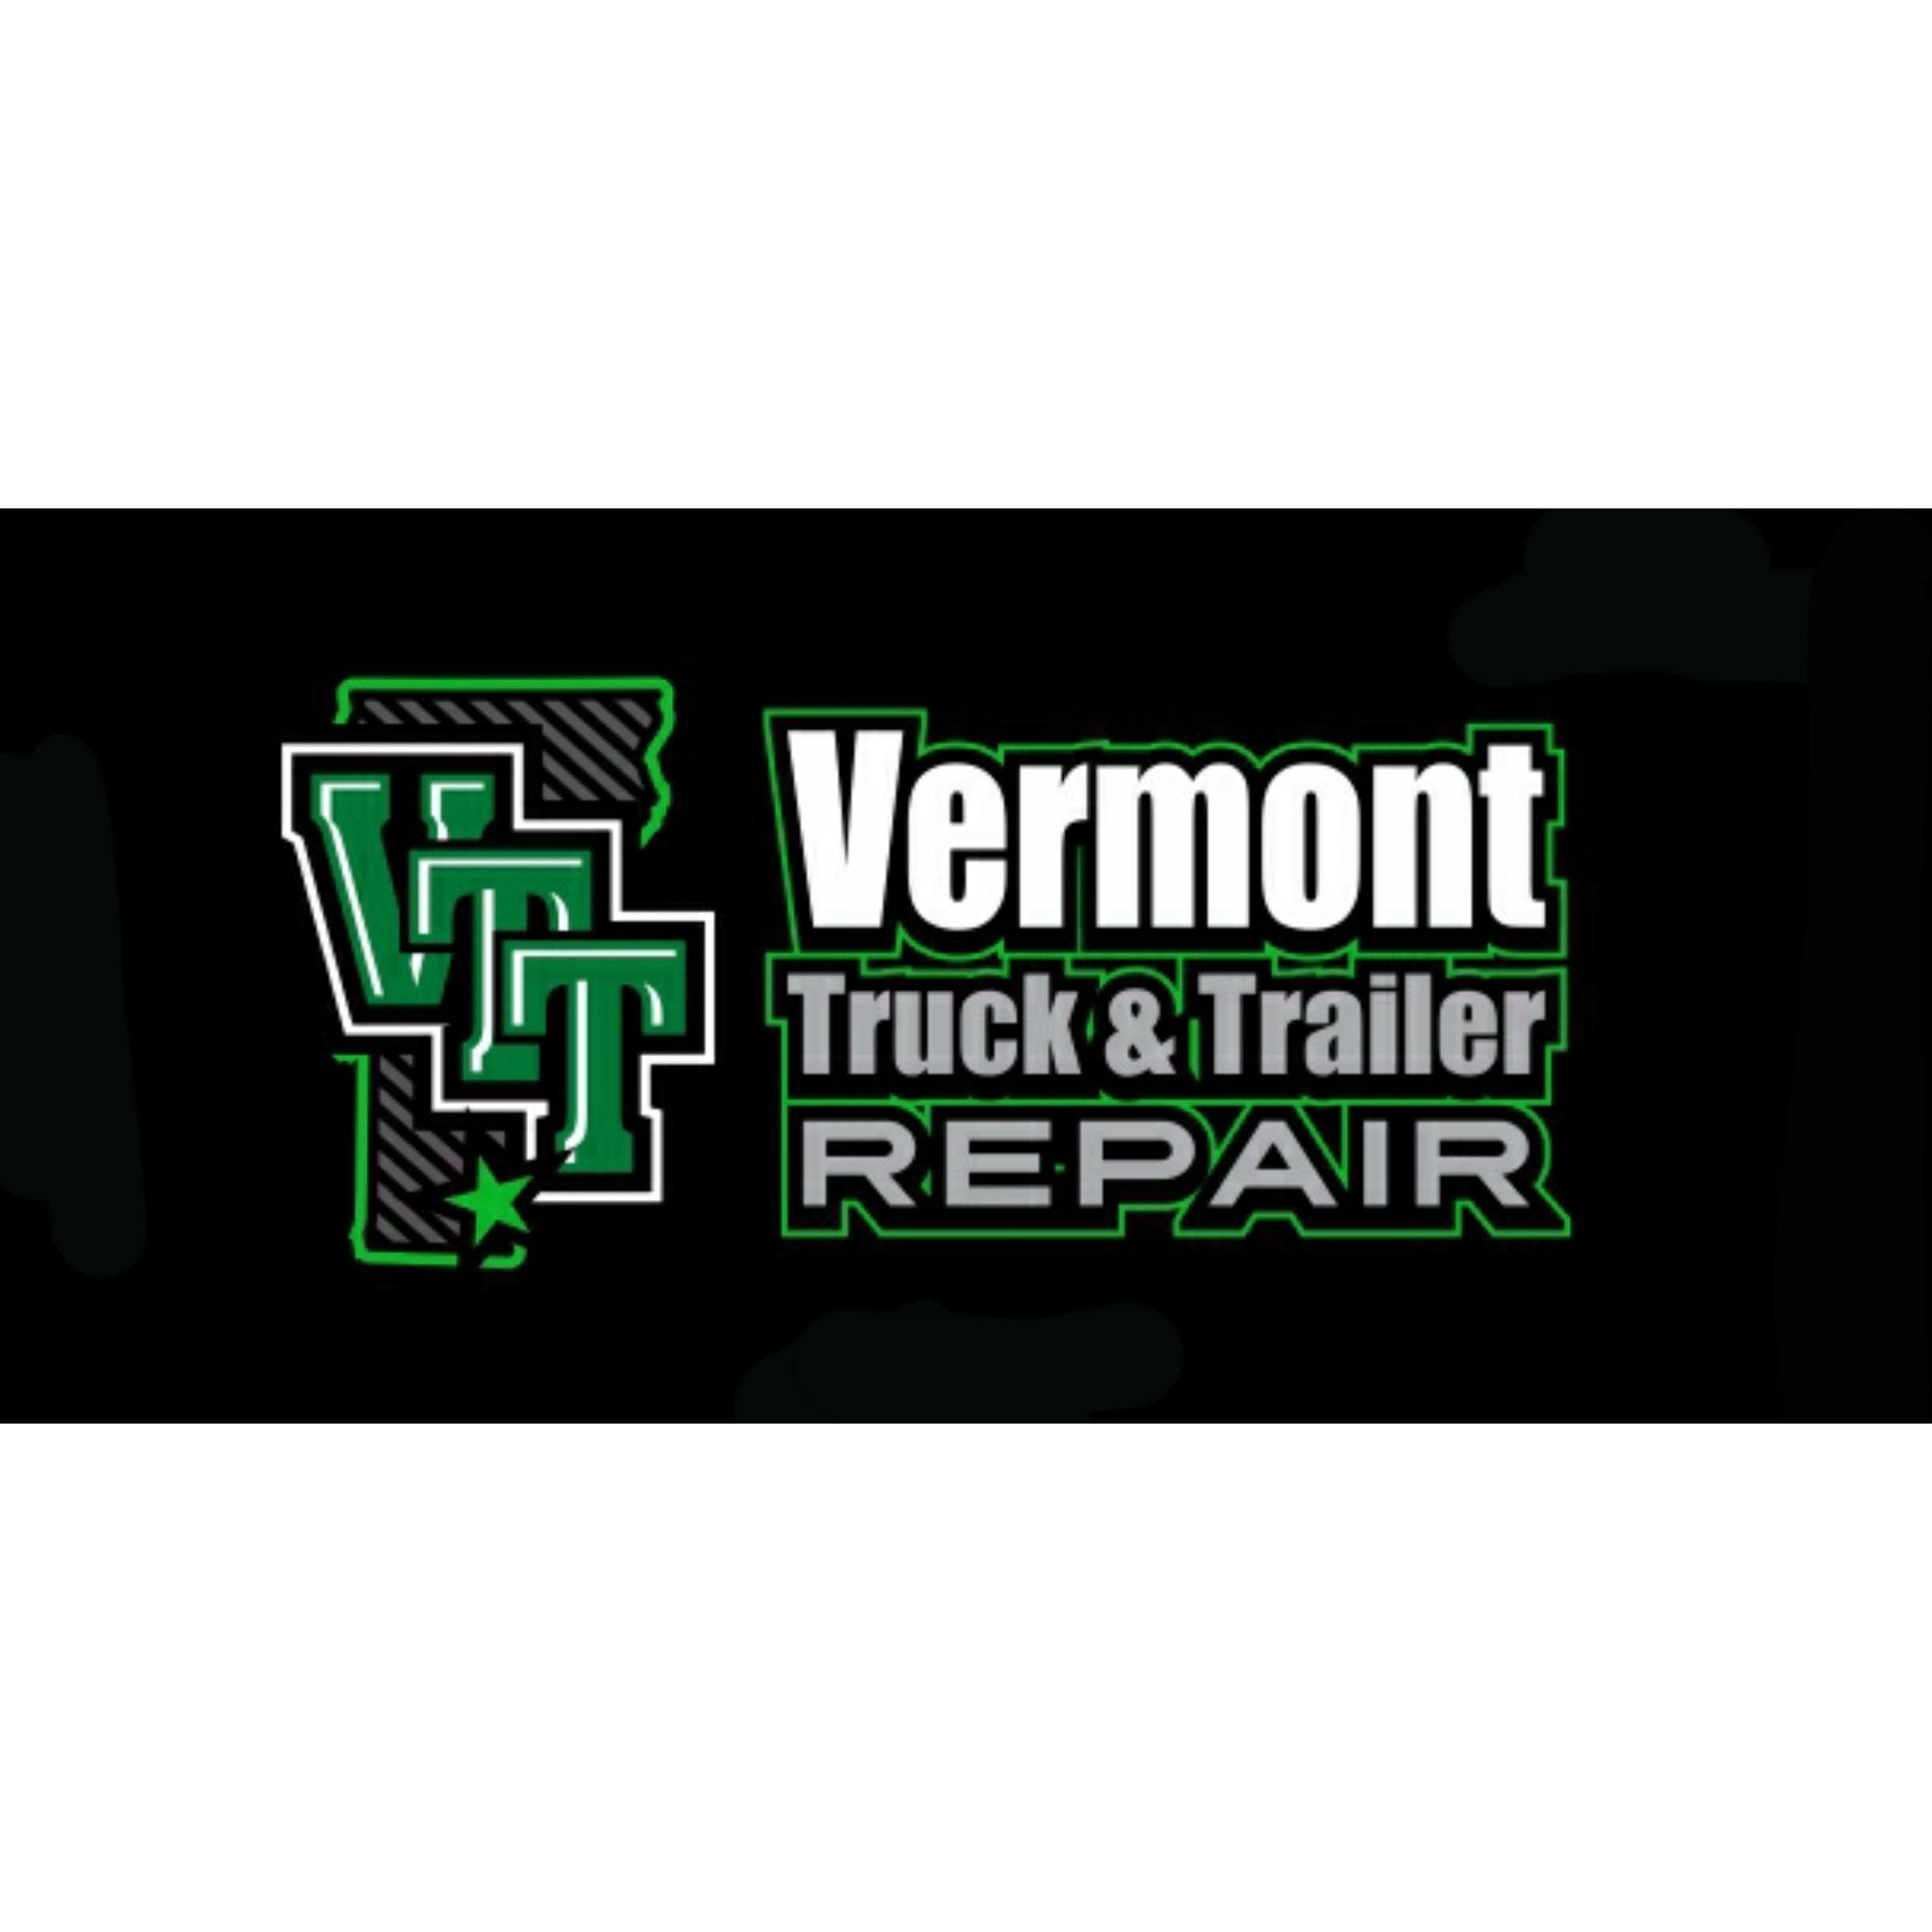 Vermont Truck & Trailer Repair LLC - Vernon, VT 05354 - (802)579-1733 | ShowMeLocal.com